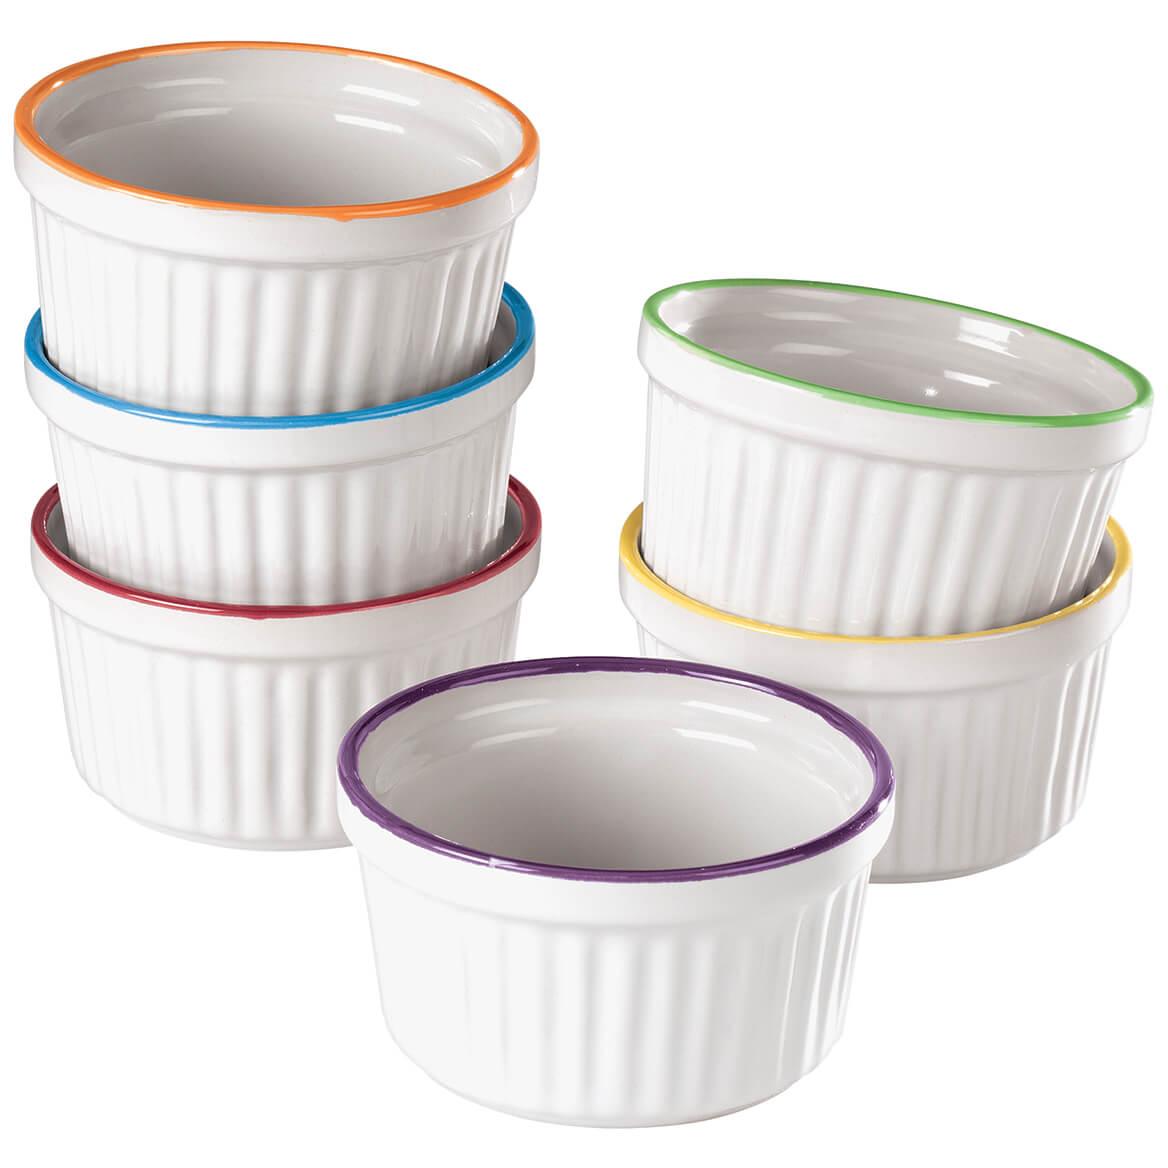 Colorful Ramekins, Set of 6-371126